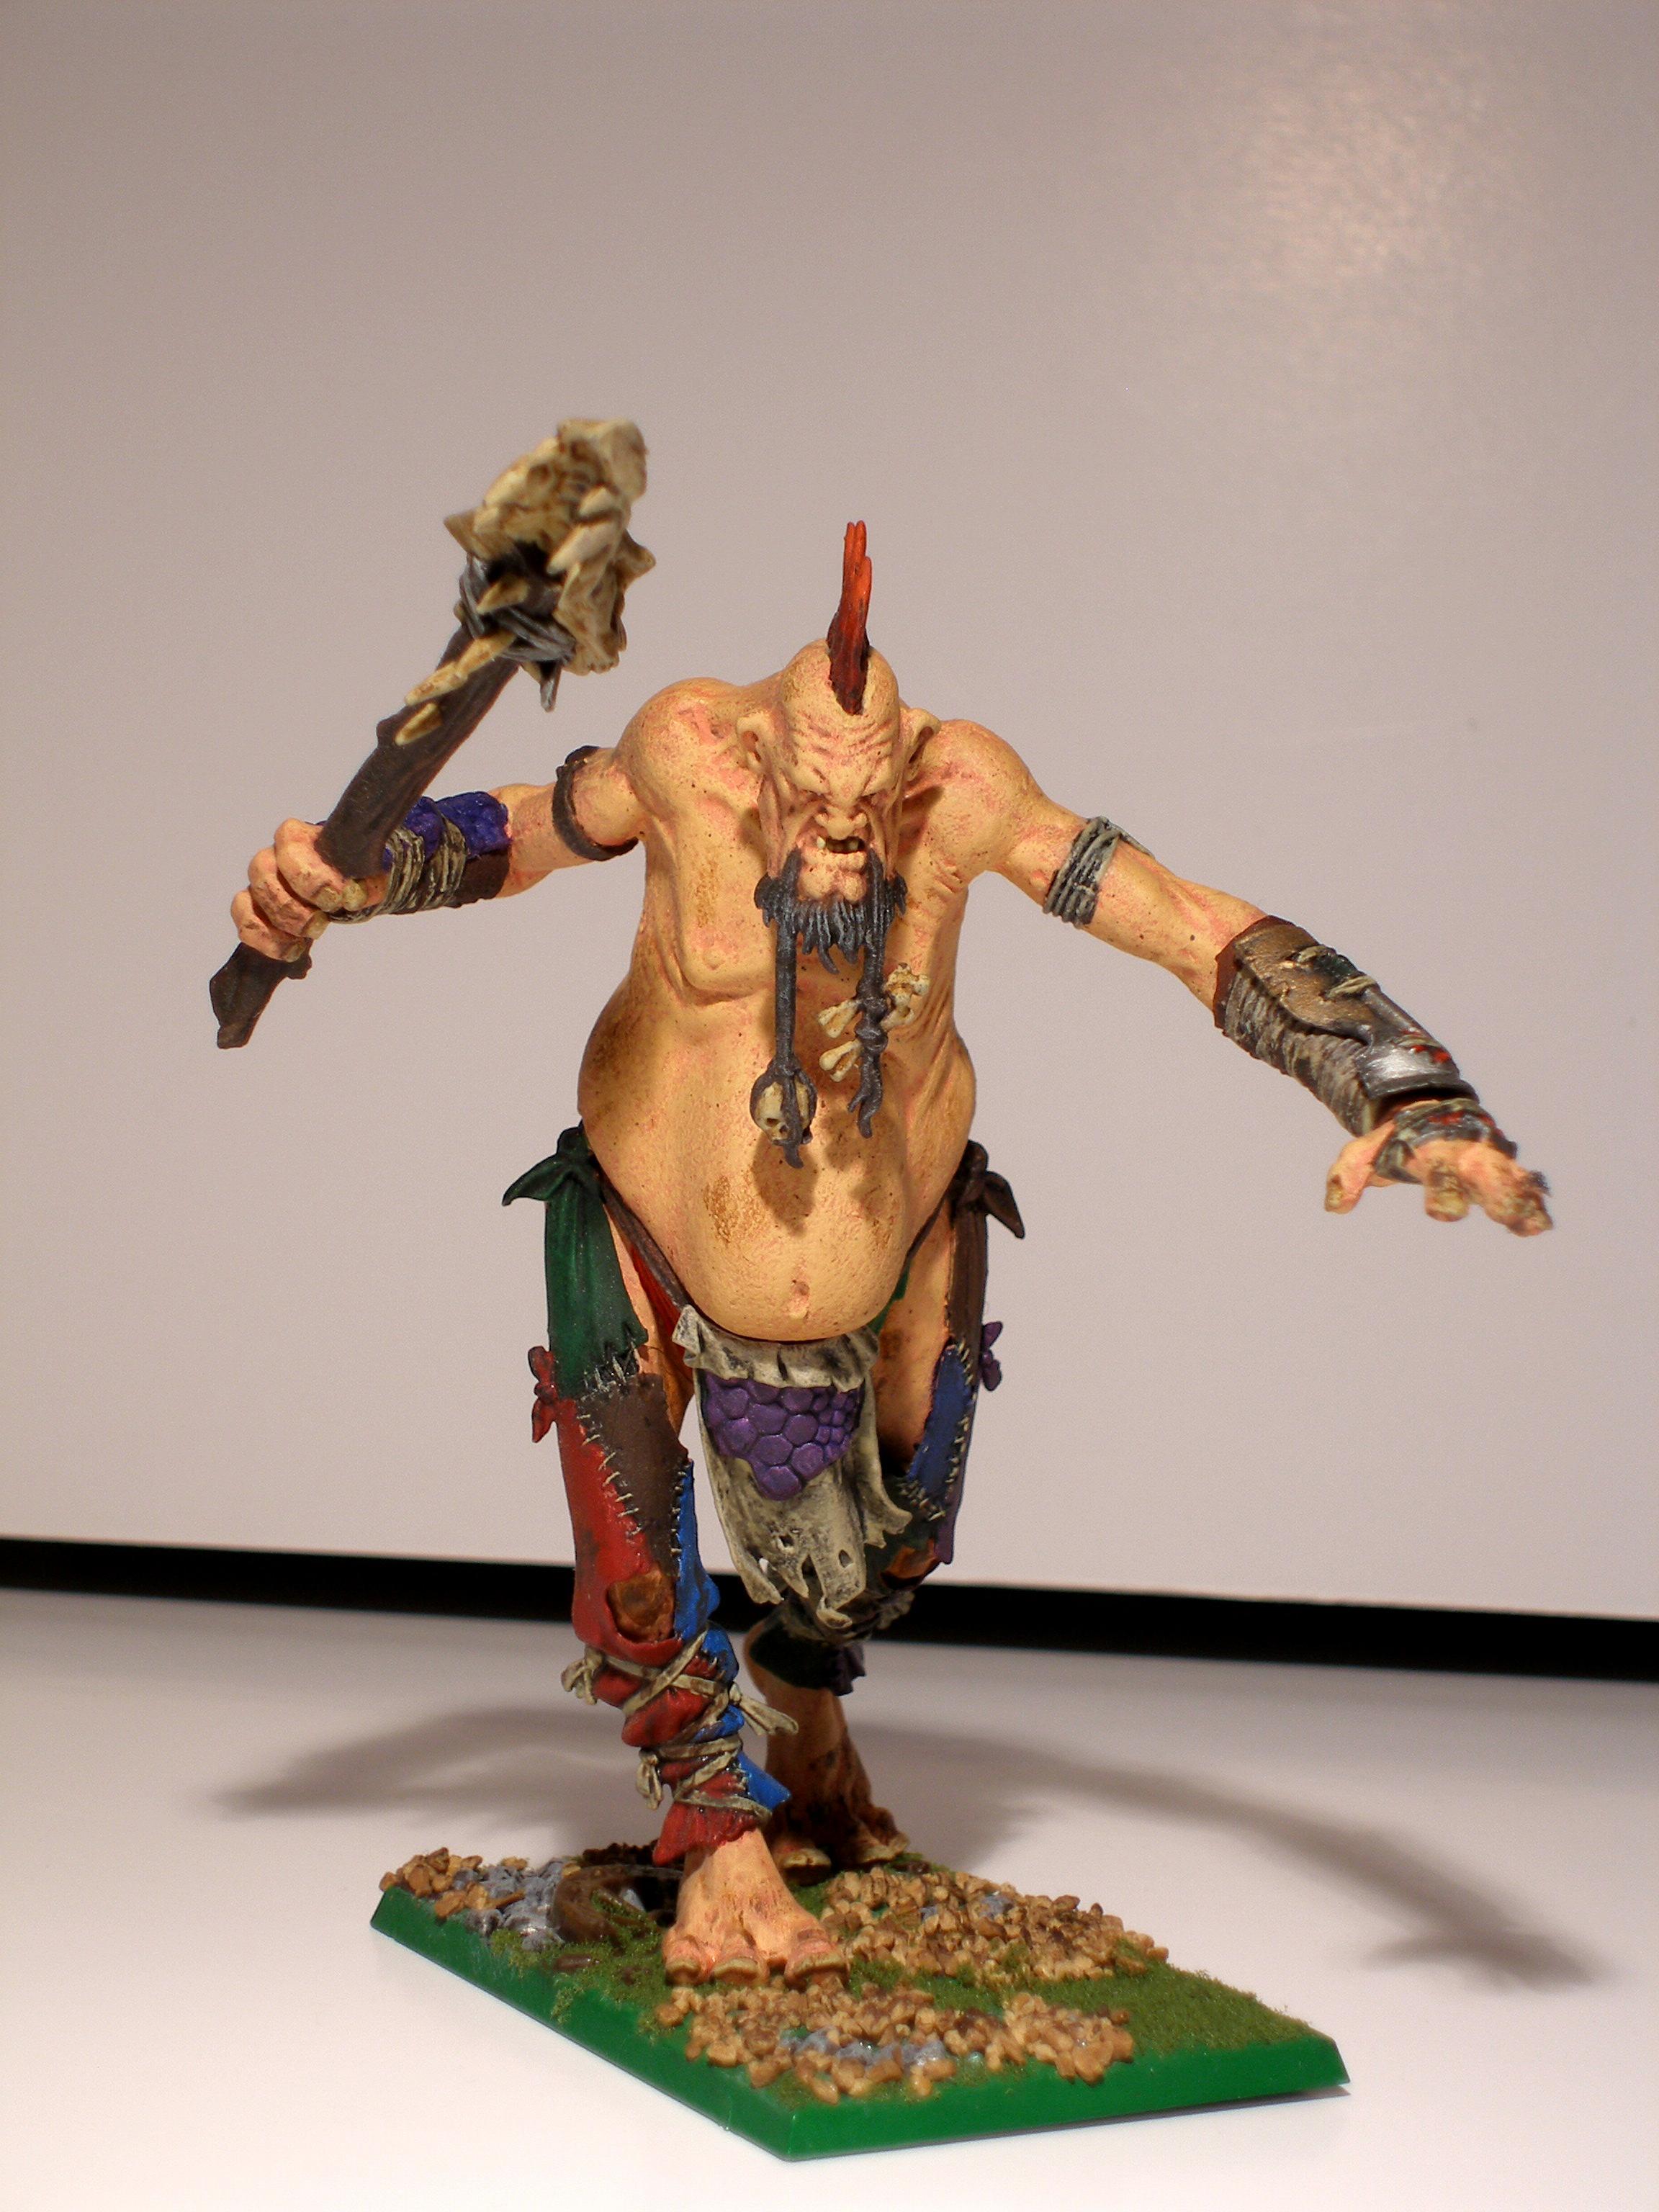 Giant, Night Goblins, Orcs